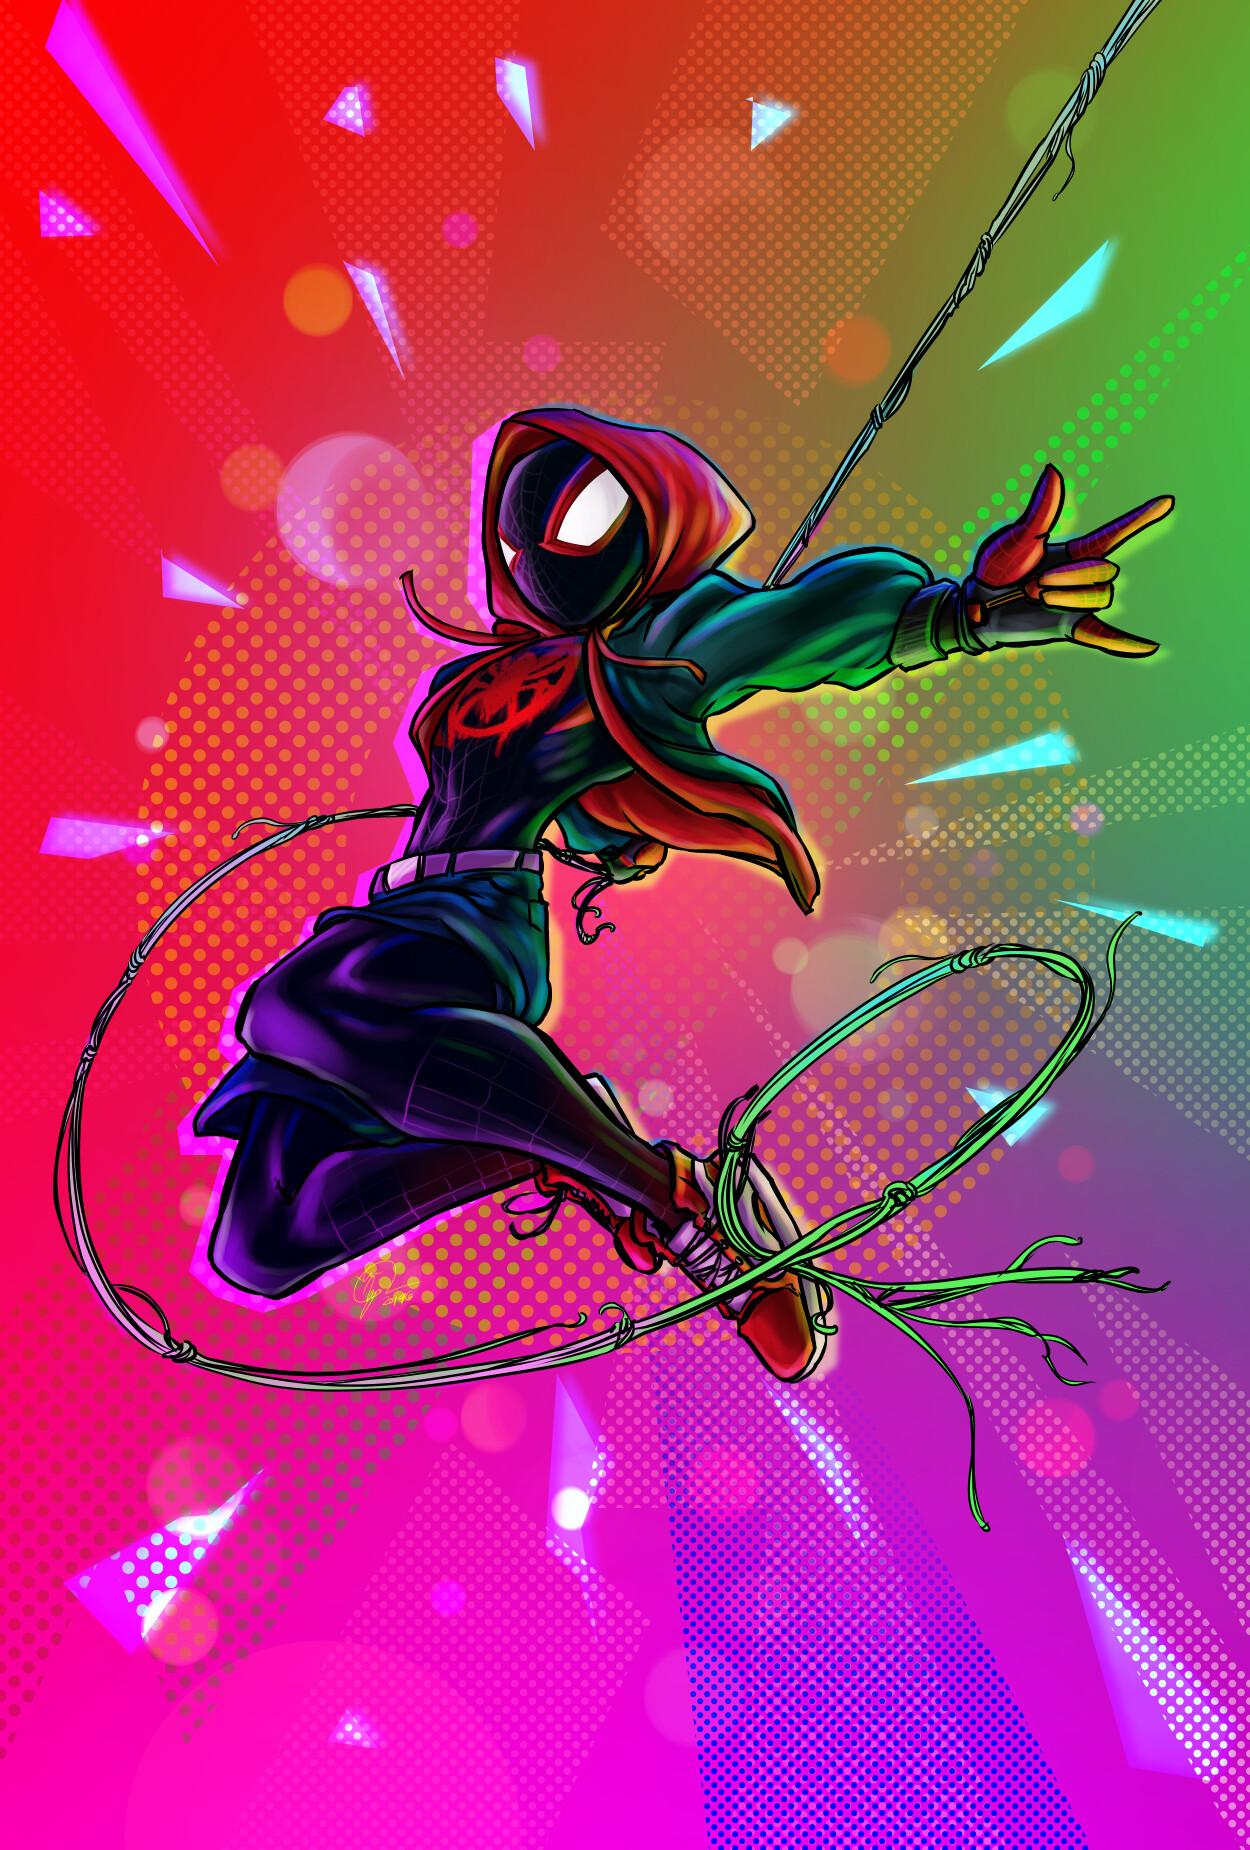 Spider-Man, Miles Morales